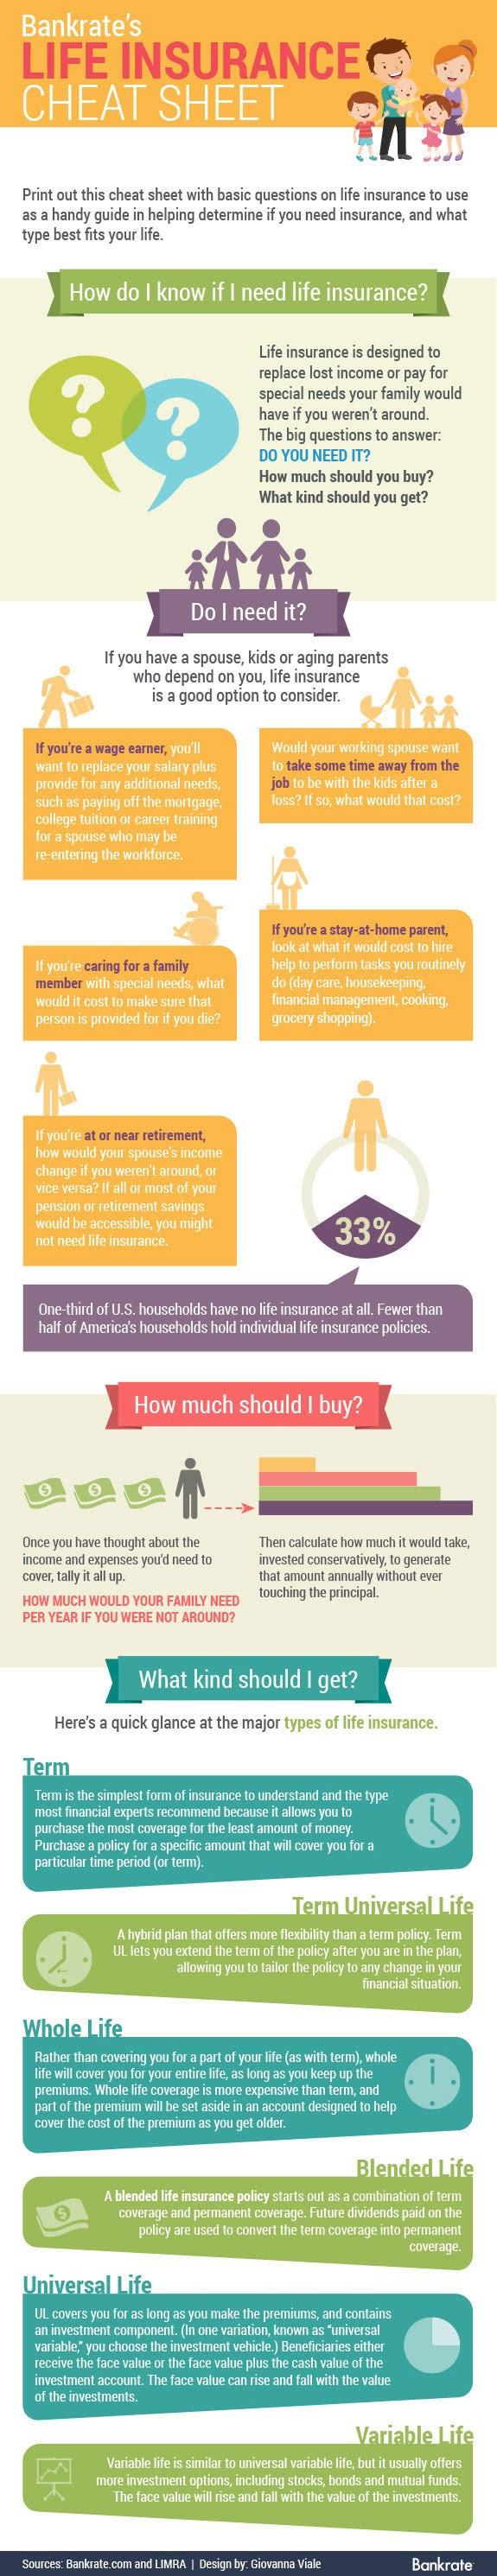 Life Insurance: A Cheat Sheet on the Basics | Bankrate.com